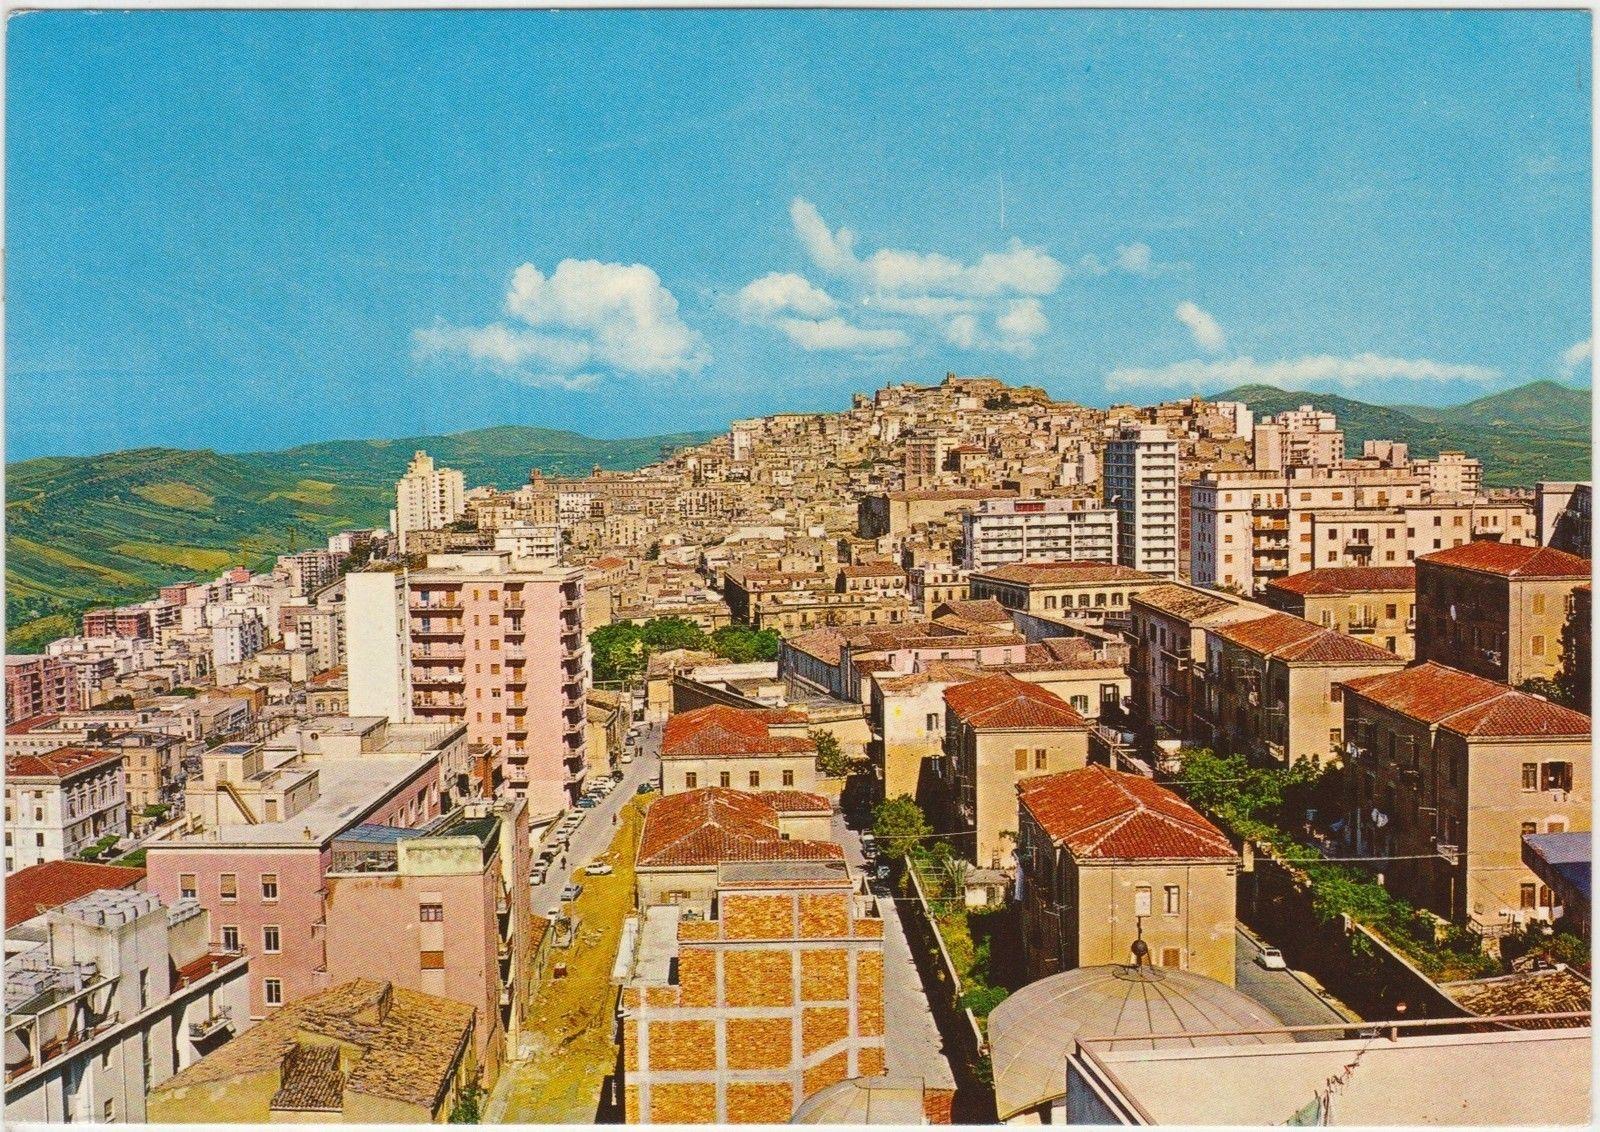 Agrigento-Panorama-1969